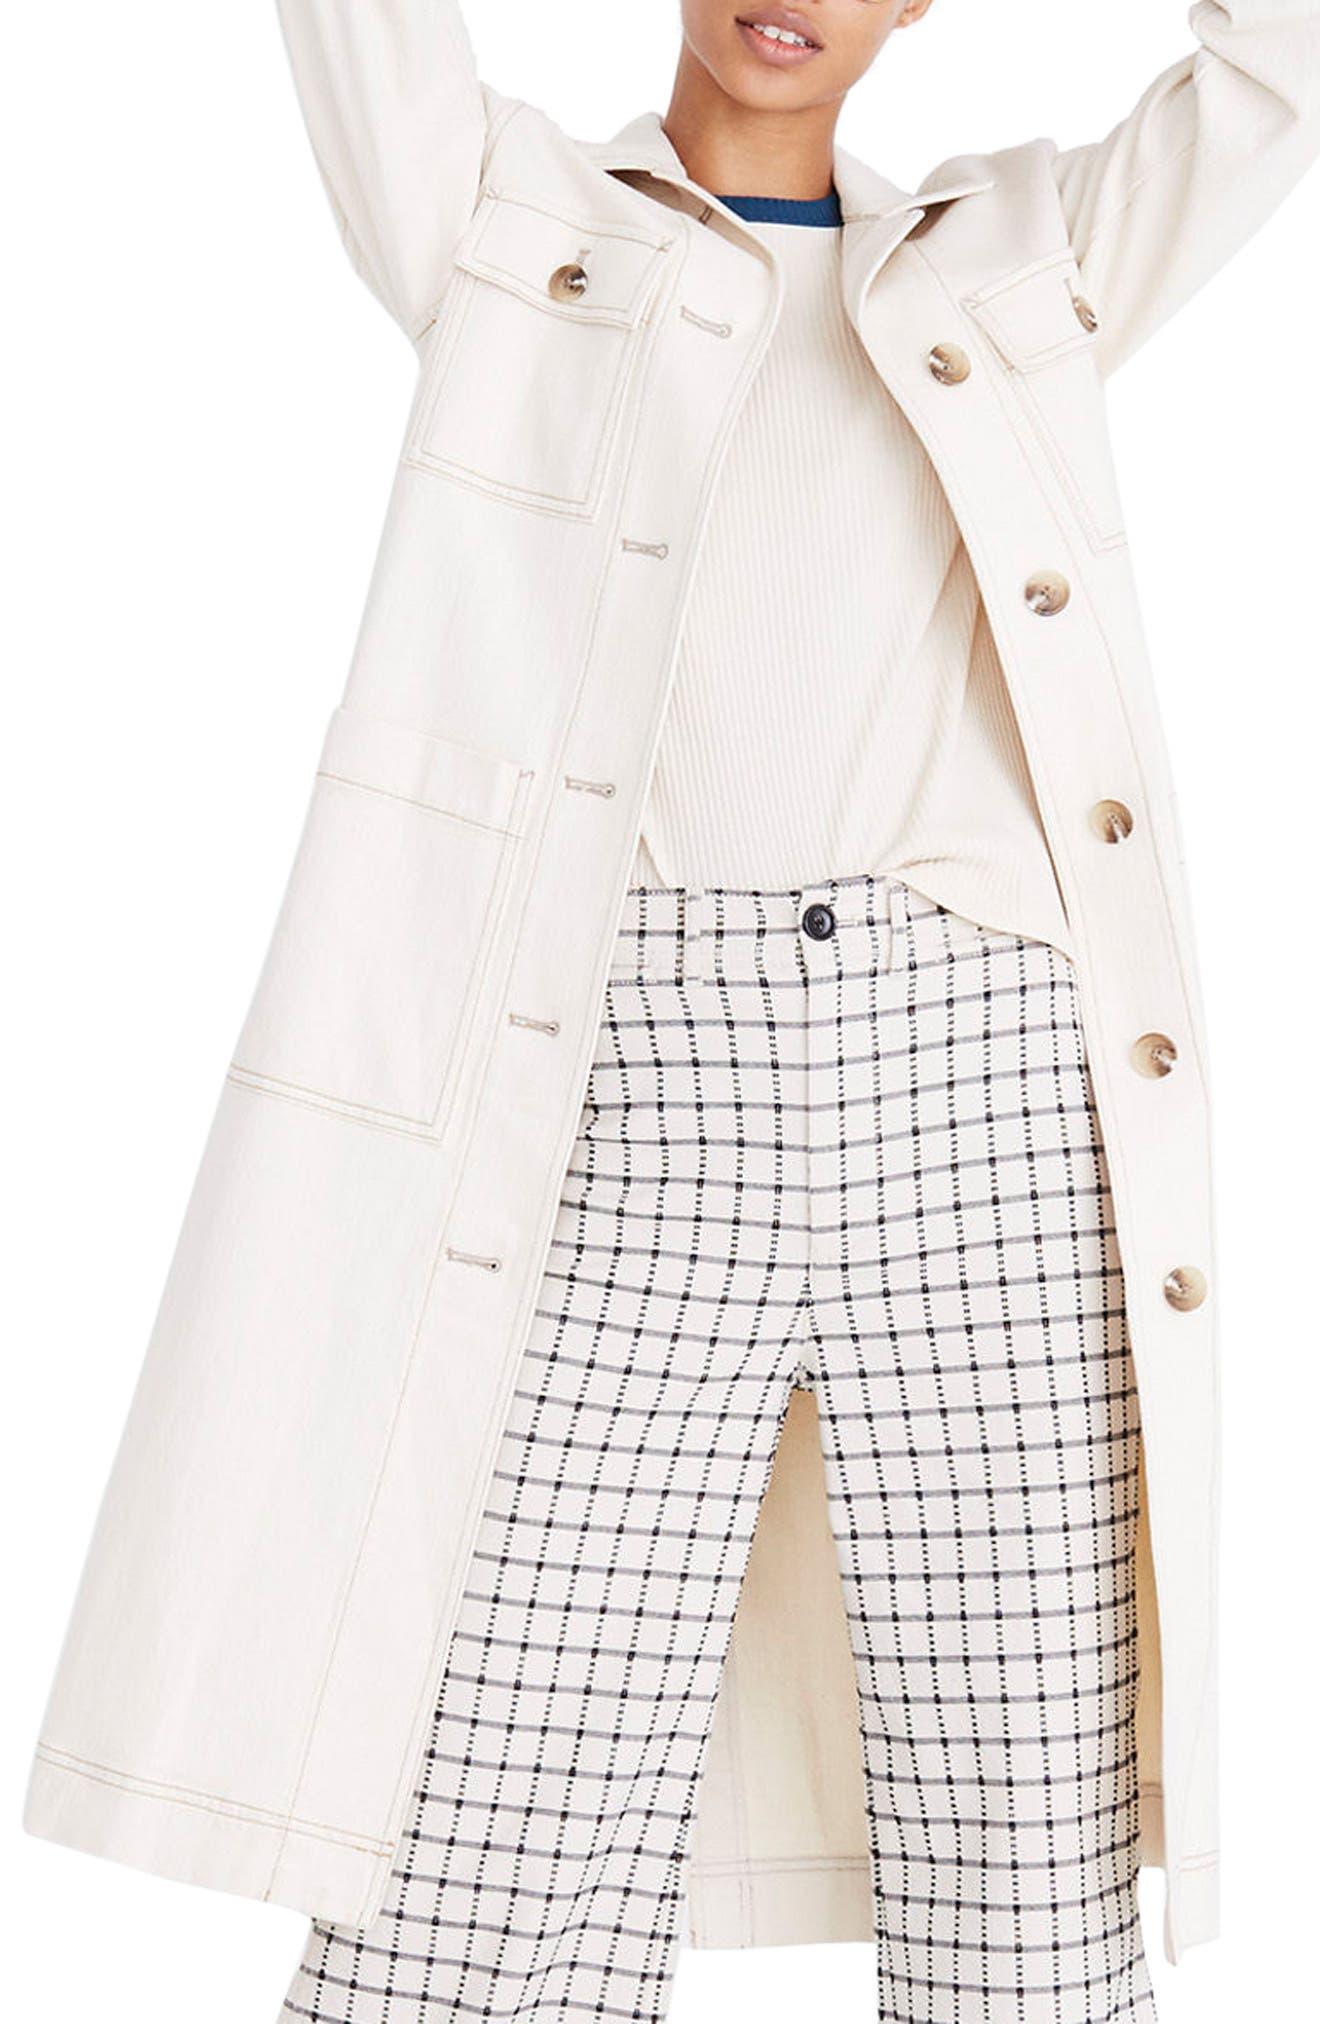 Cline Duster Coat,                         Main,                         color,